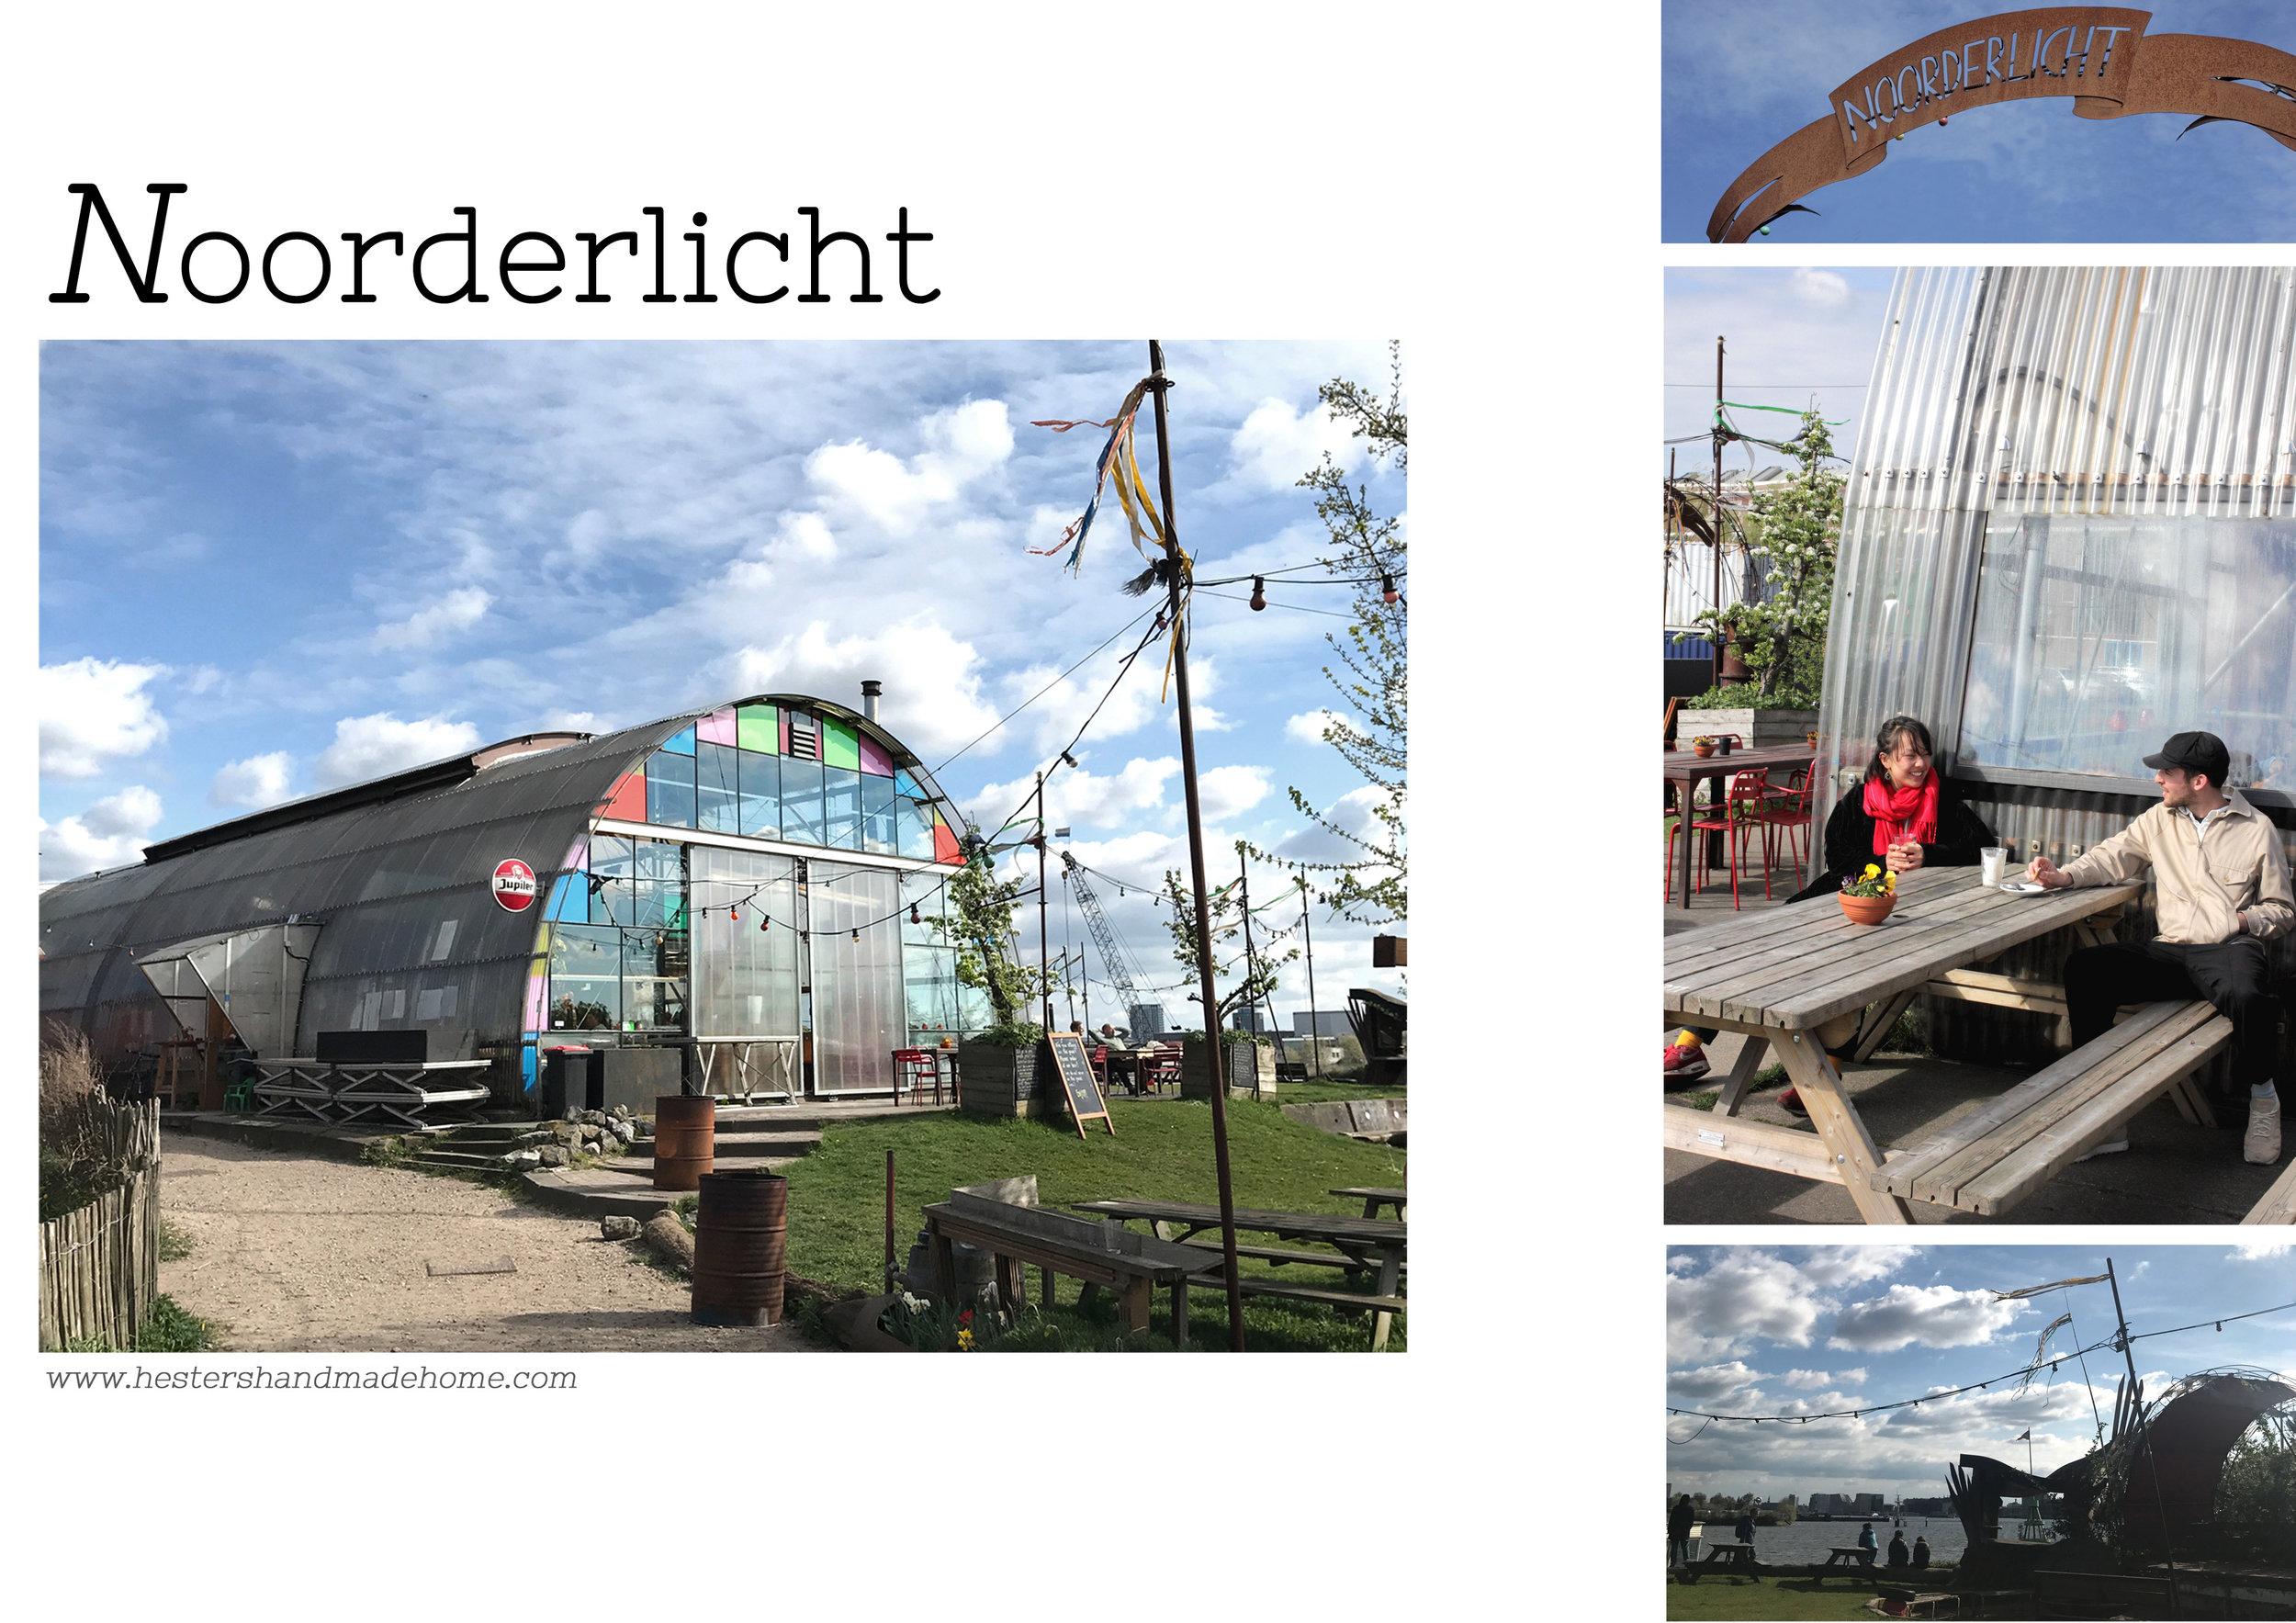 Noorderlicht Amsterdam city guide by Hesters Handmade Home